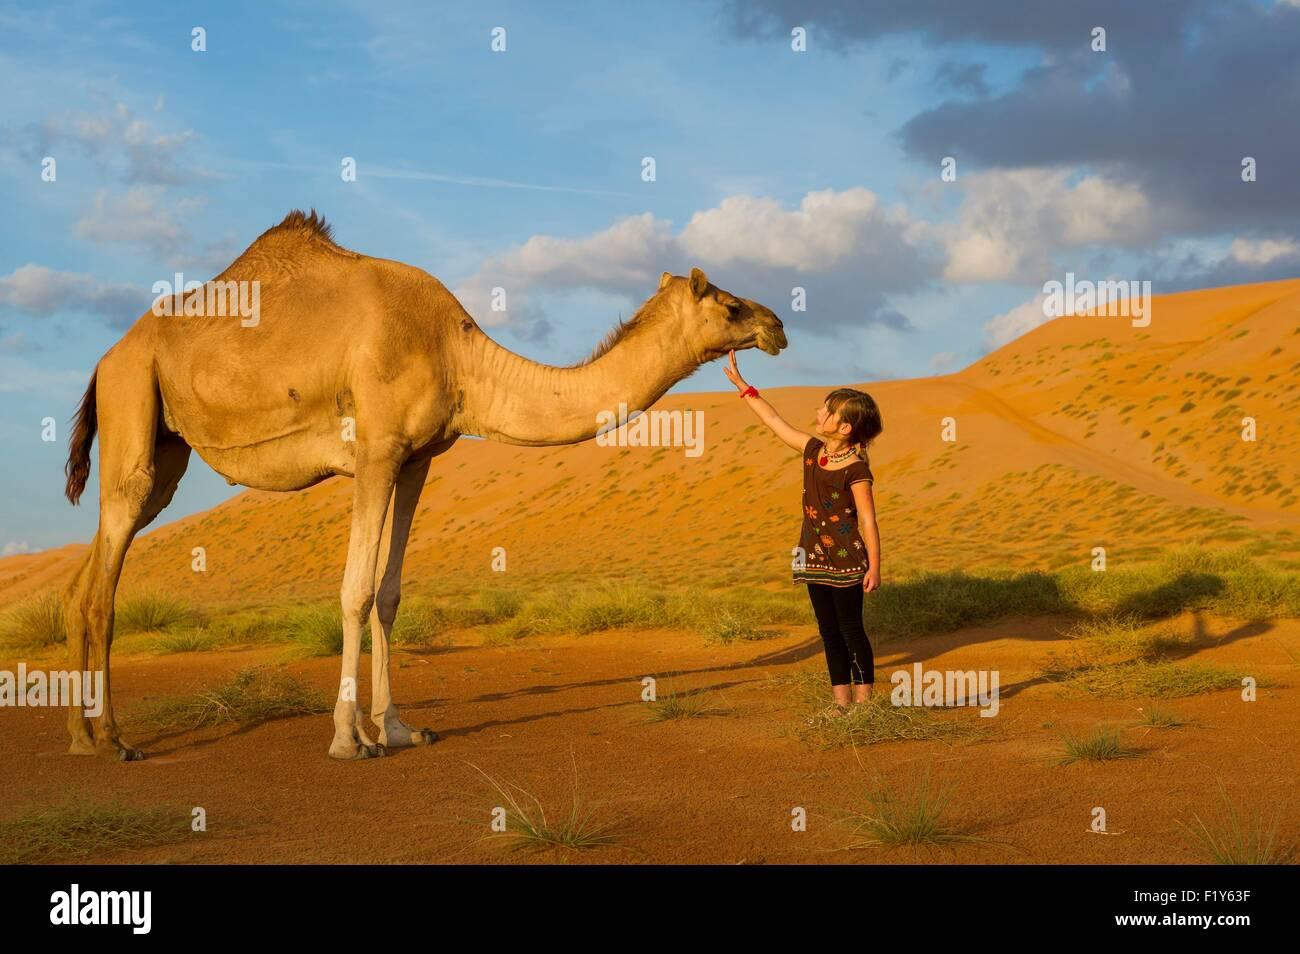 Oman, Sharquiyah Sands the Eastern Sands, Bidiyah, sunset in the dunes - Stock Image